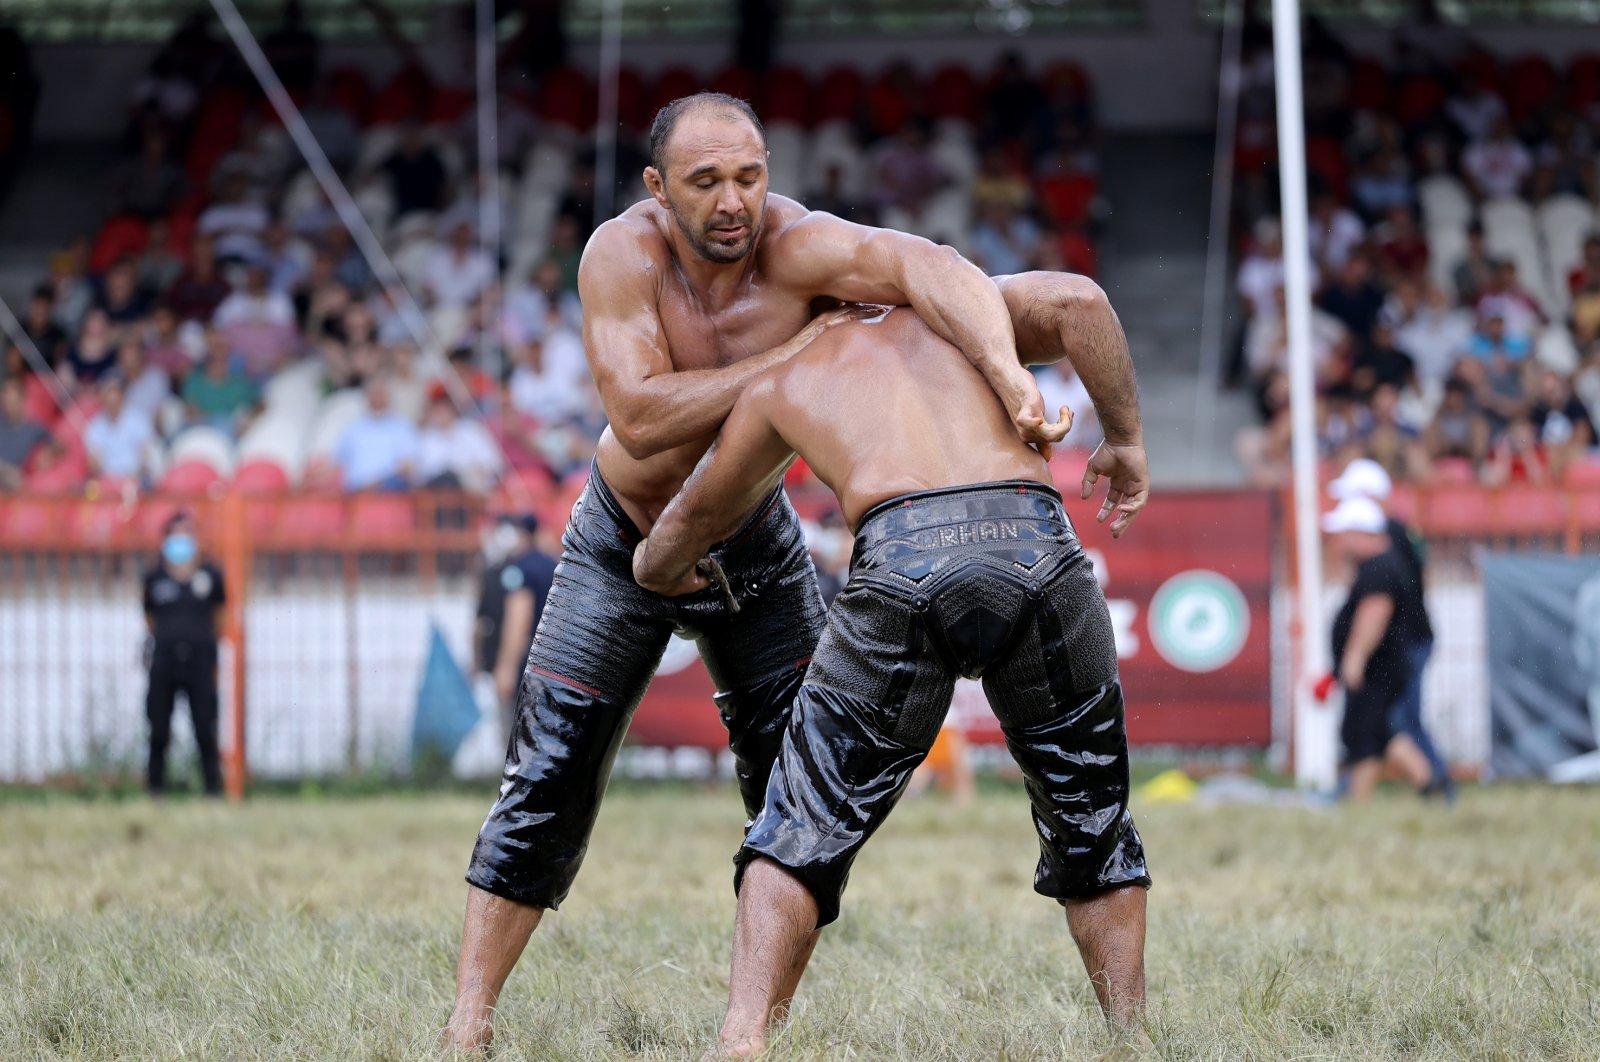 Ali Gürbüz (left) wrestles with Orhan Okulu in the semi-finals at the 660th Historical Kırkpınar Oil Wrestling Festival in Turkey's Edirne province, July 11, 2021. (AA Photo)